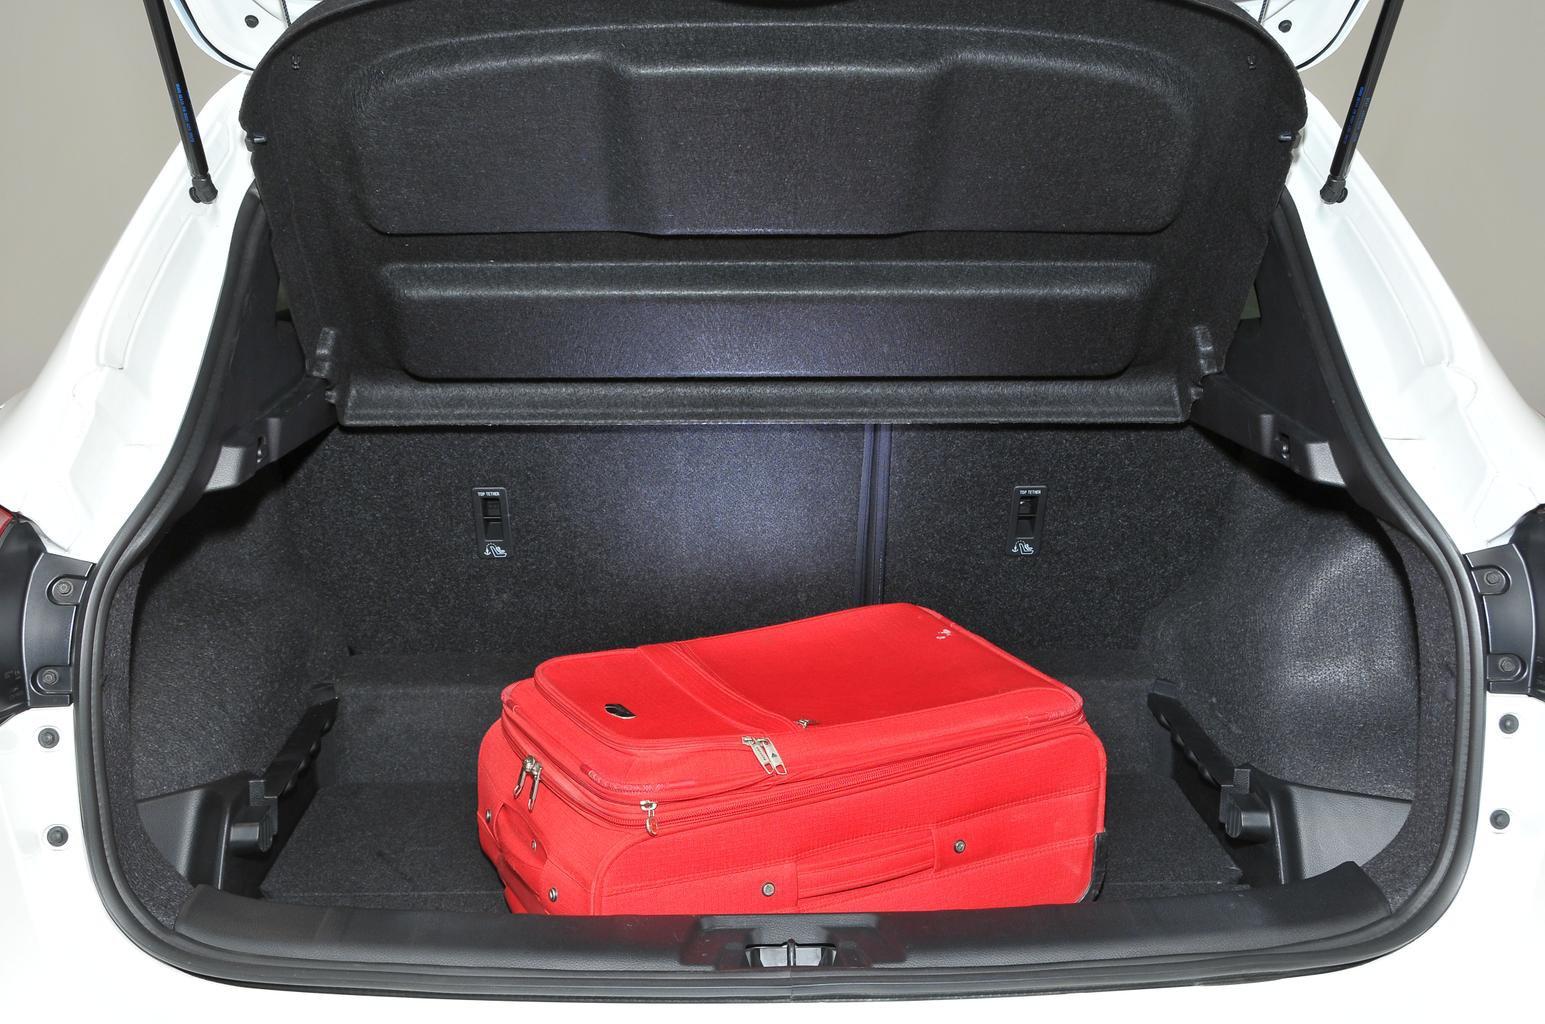 Nissan Qashqai hatchback (14 - present)